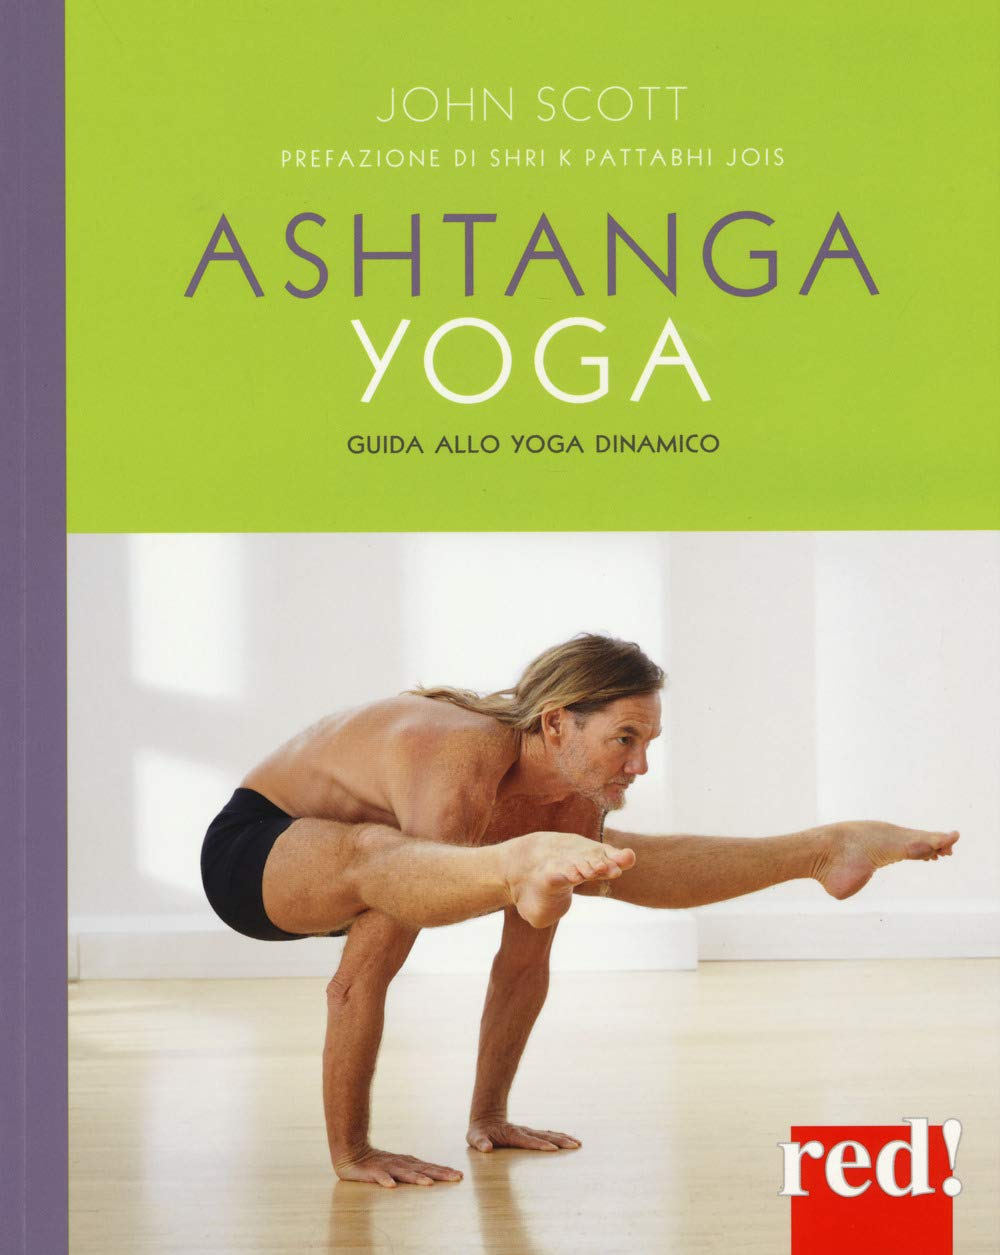 Ashtanga yoga. Guida allo yoga dinamico (Discipline): Amazon ...